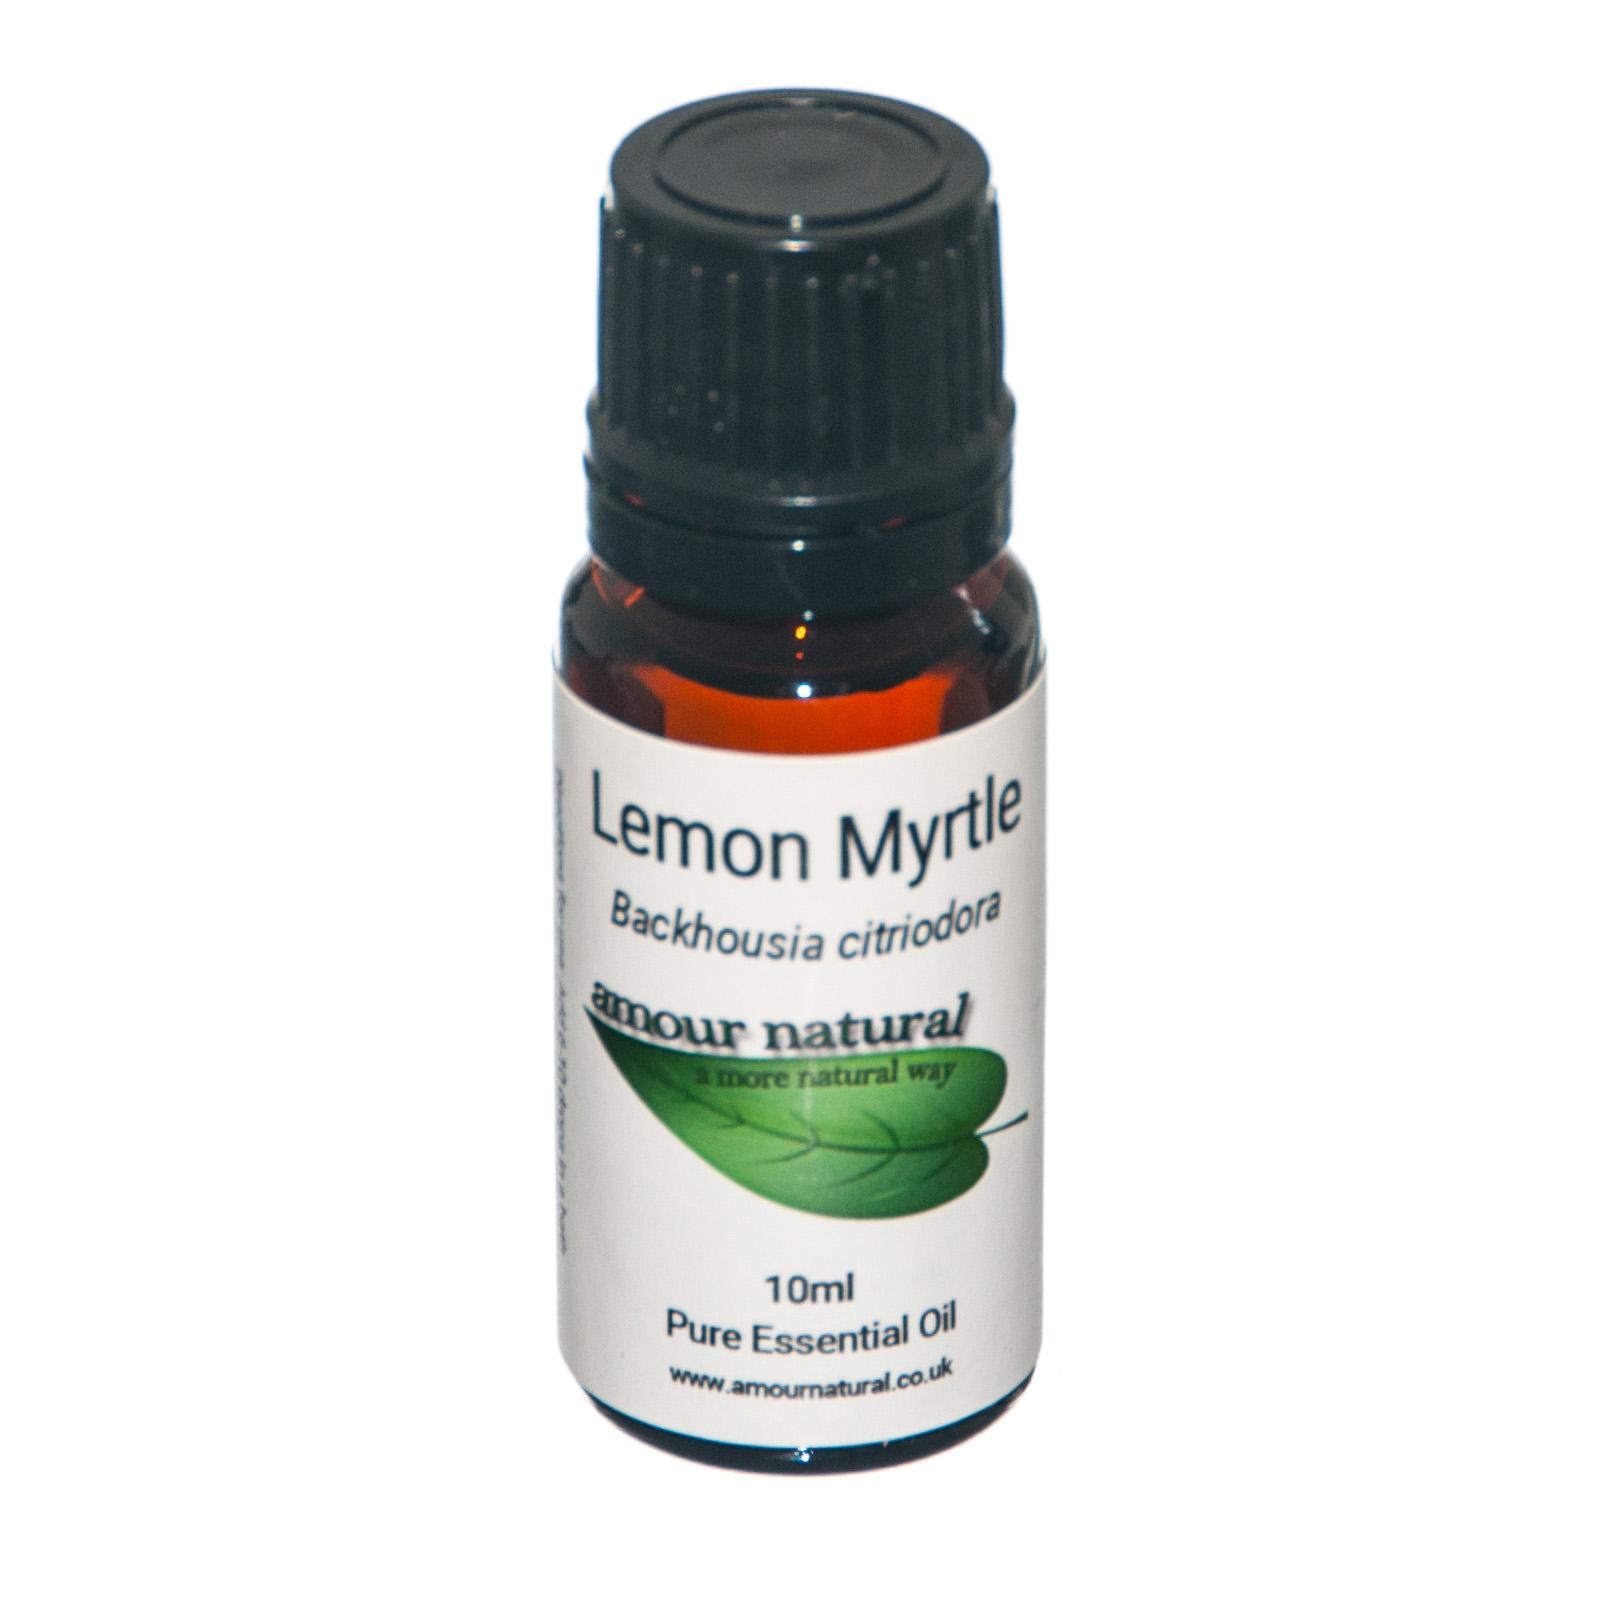 Lemon Myrtle Oil 10ml